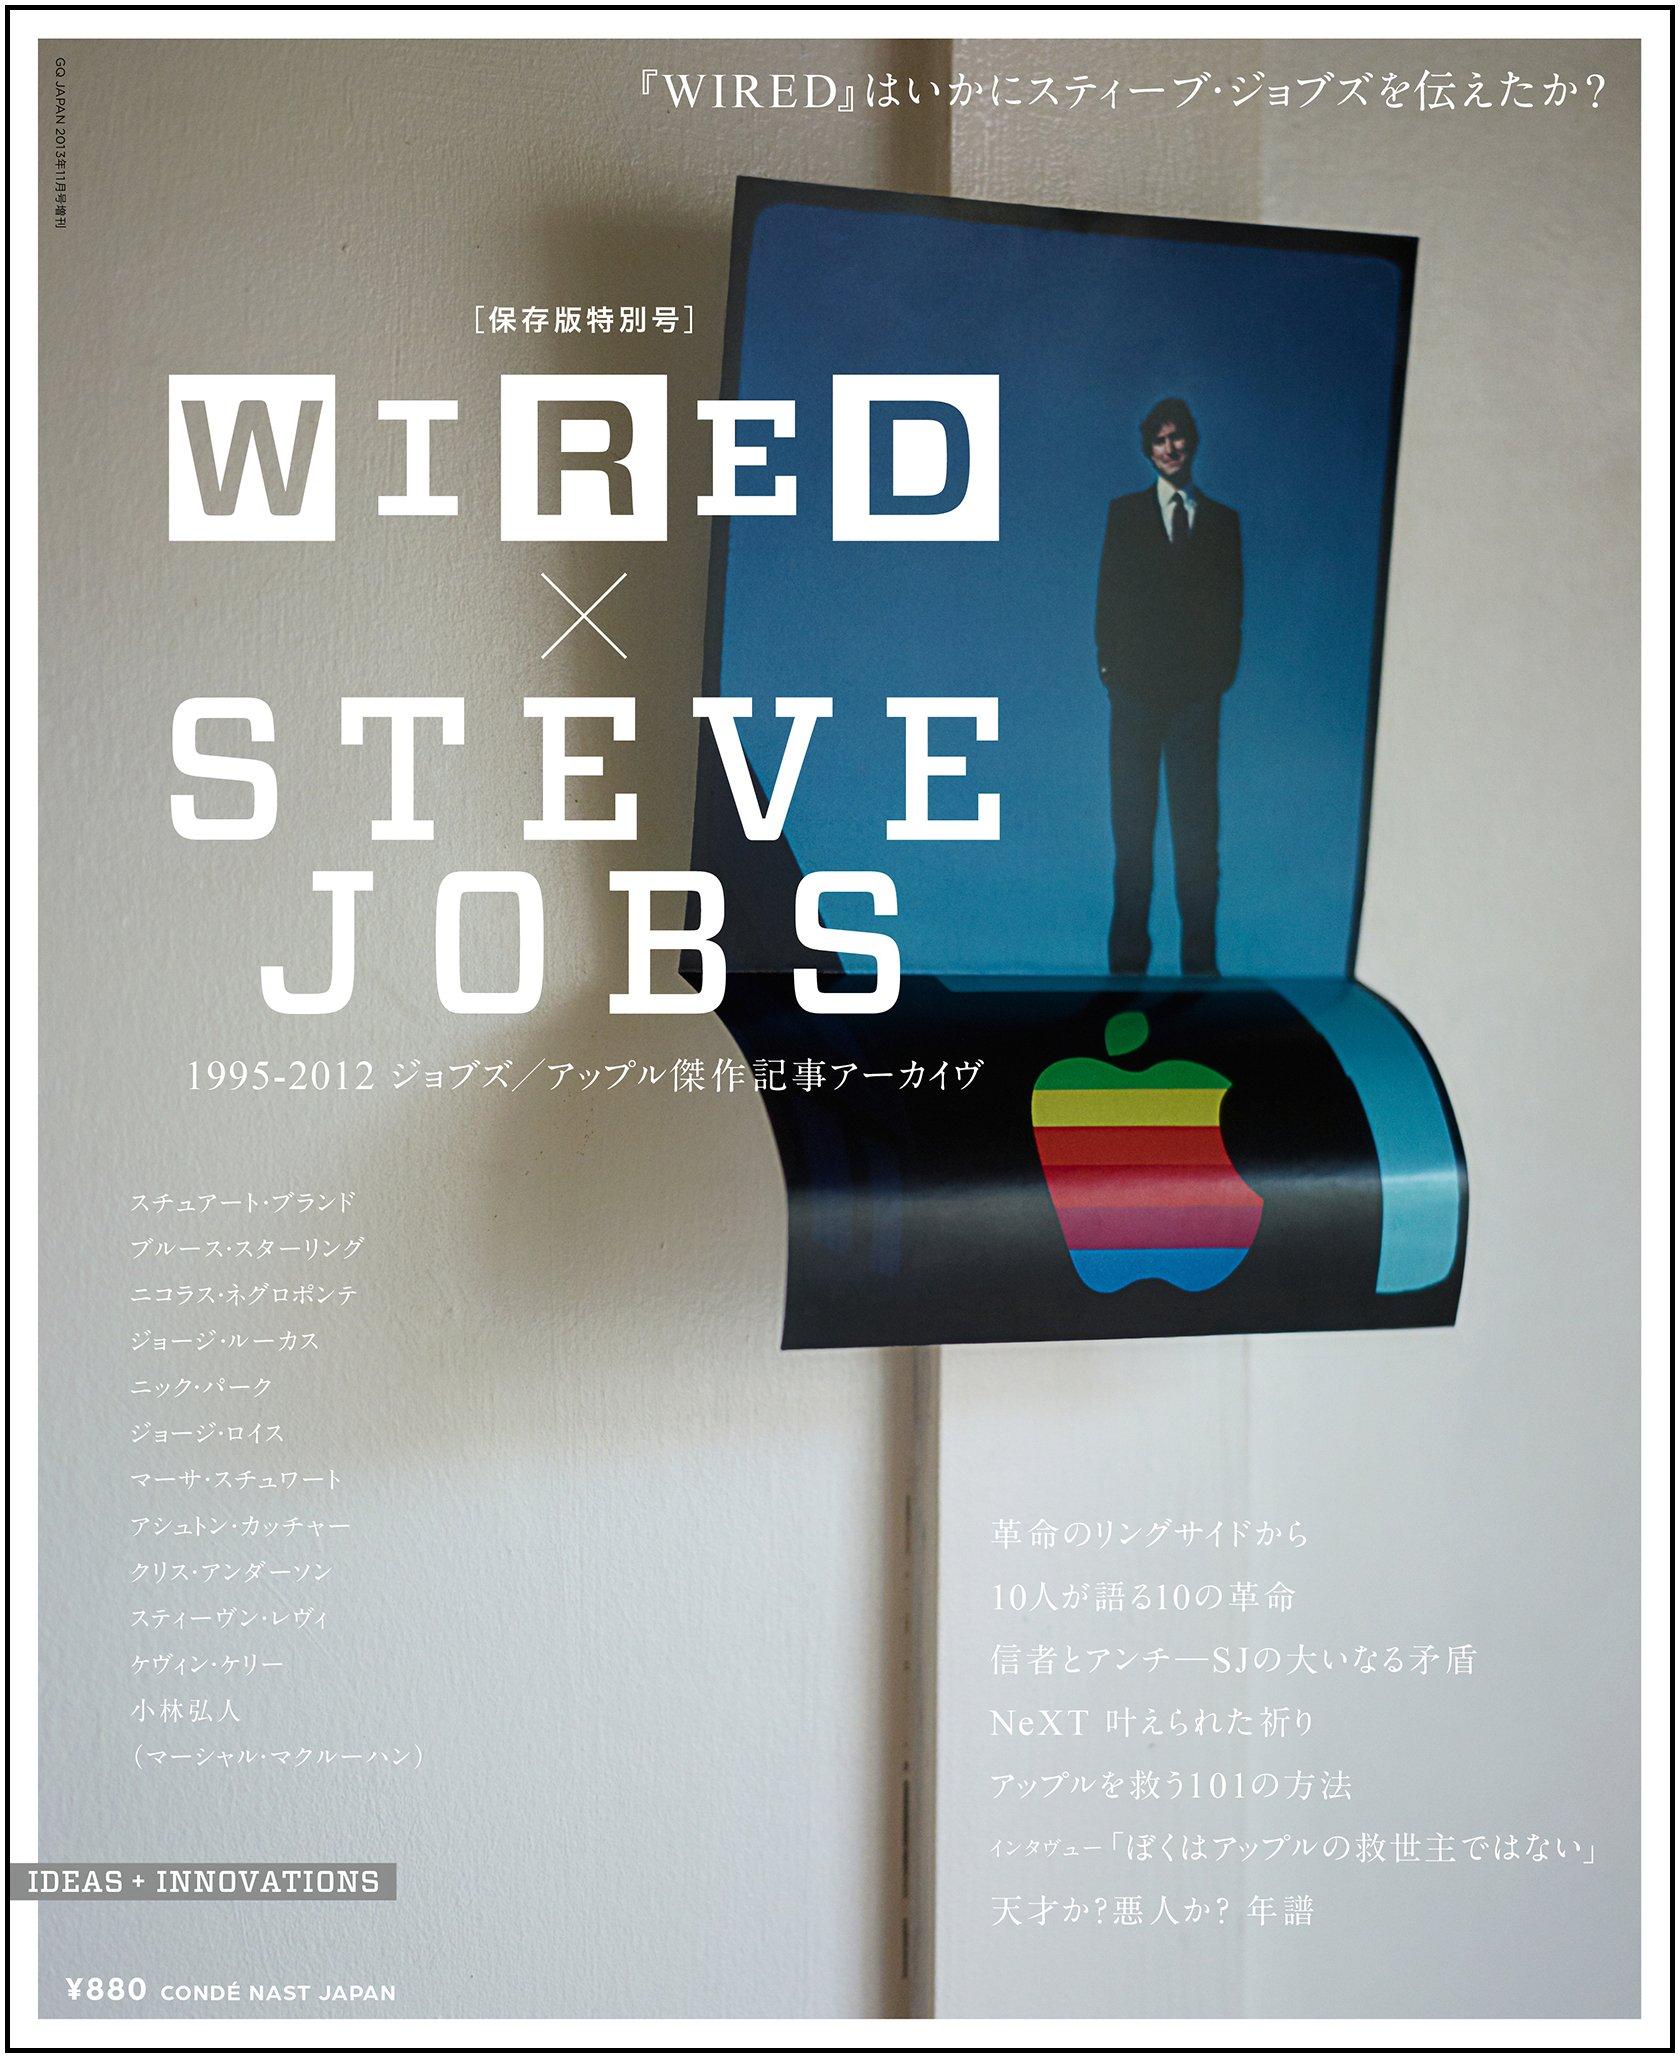 『WIRED×STEVE JOBS』GQ JAPAN 2013年11月号増刊, コンデナスト・ジャパン